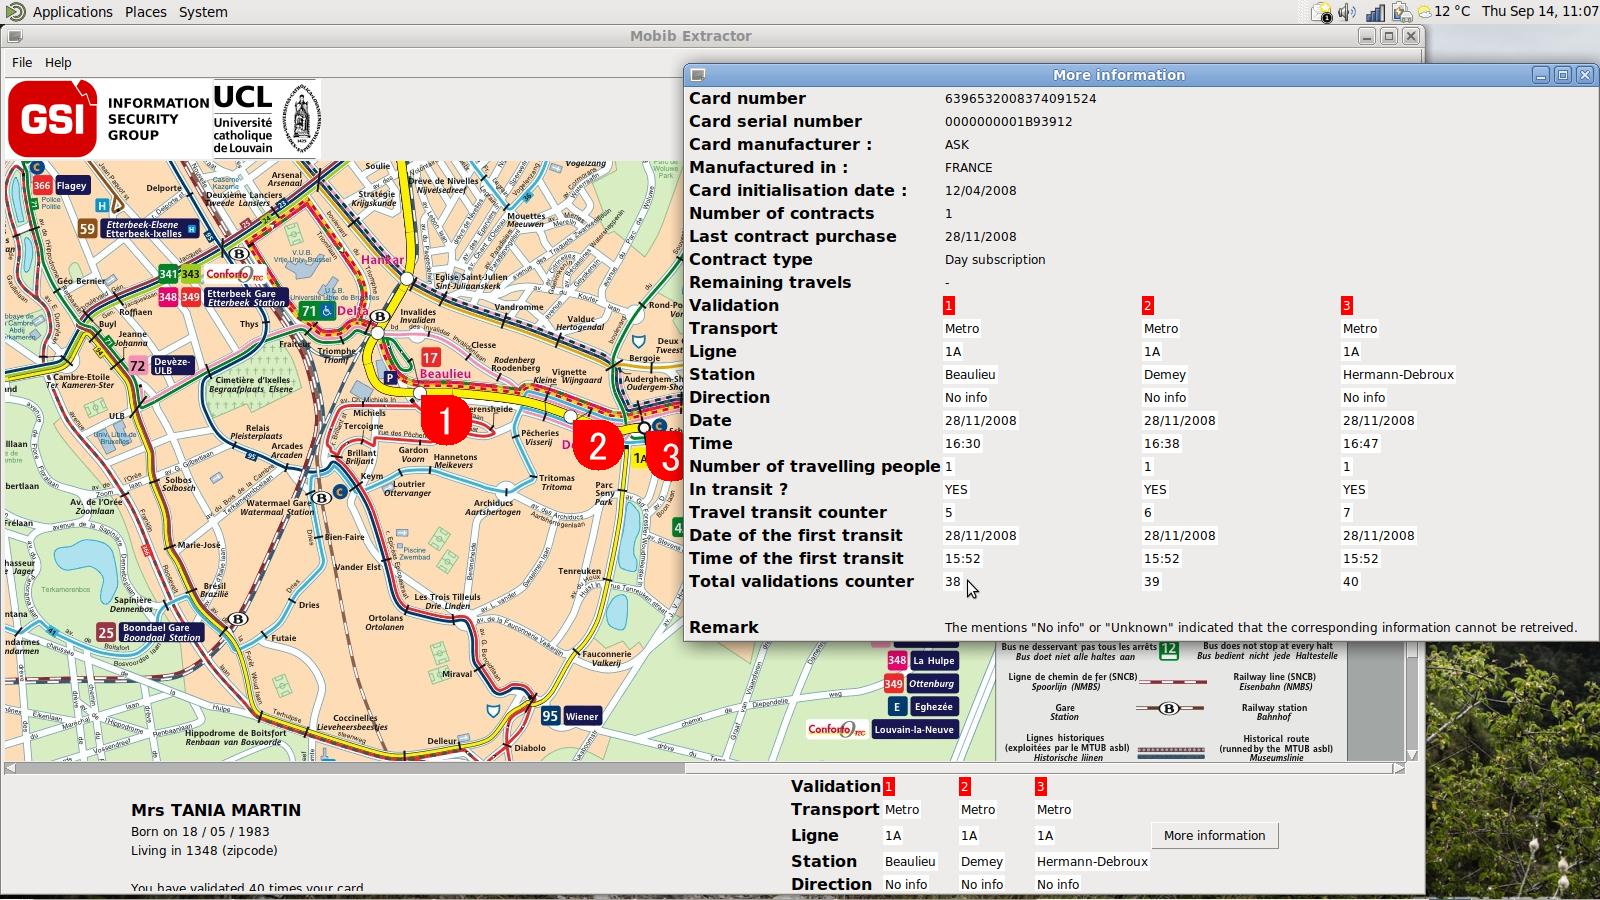 MOBIB Extractor screenshot